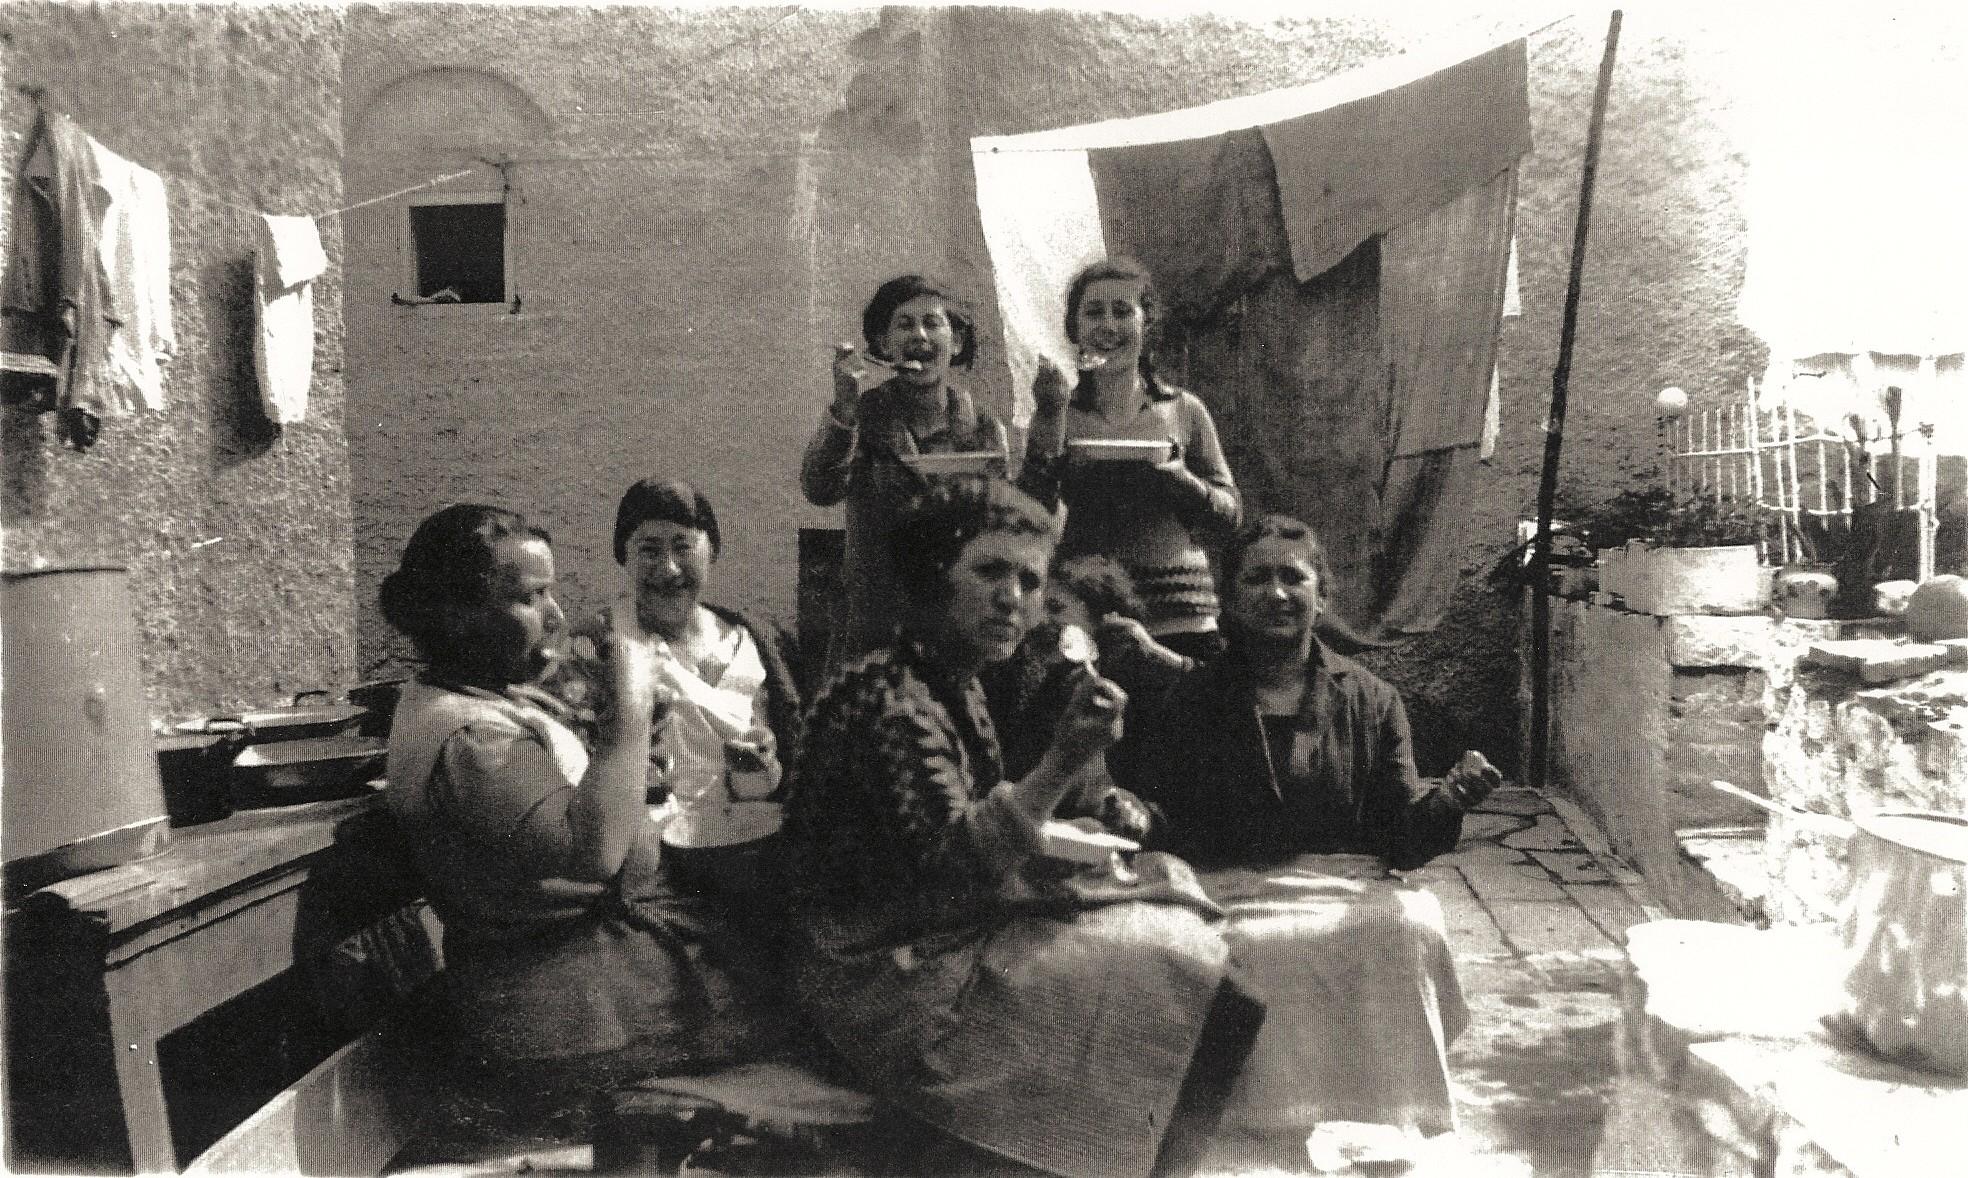 Passover in Ioannina Bechoropoulos & Attas Family 1933